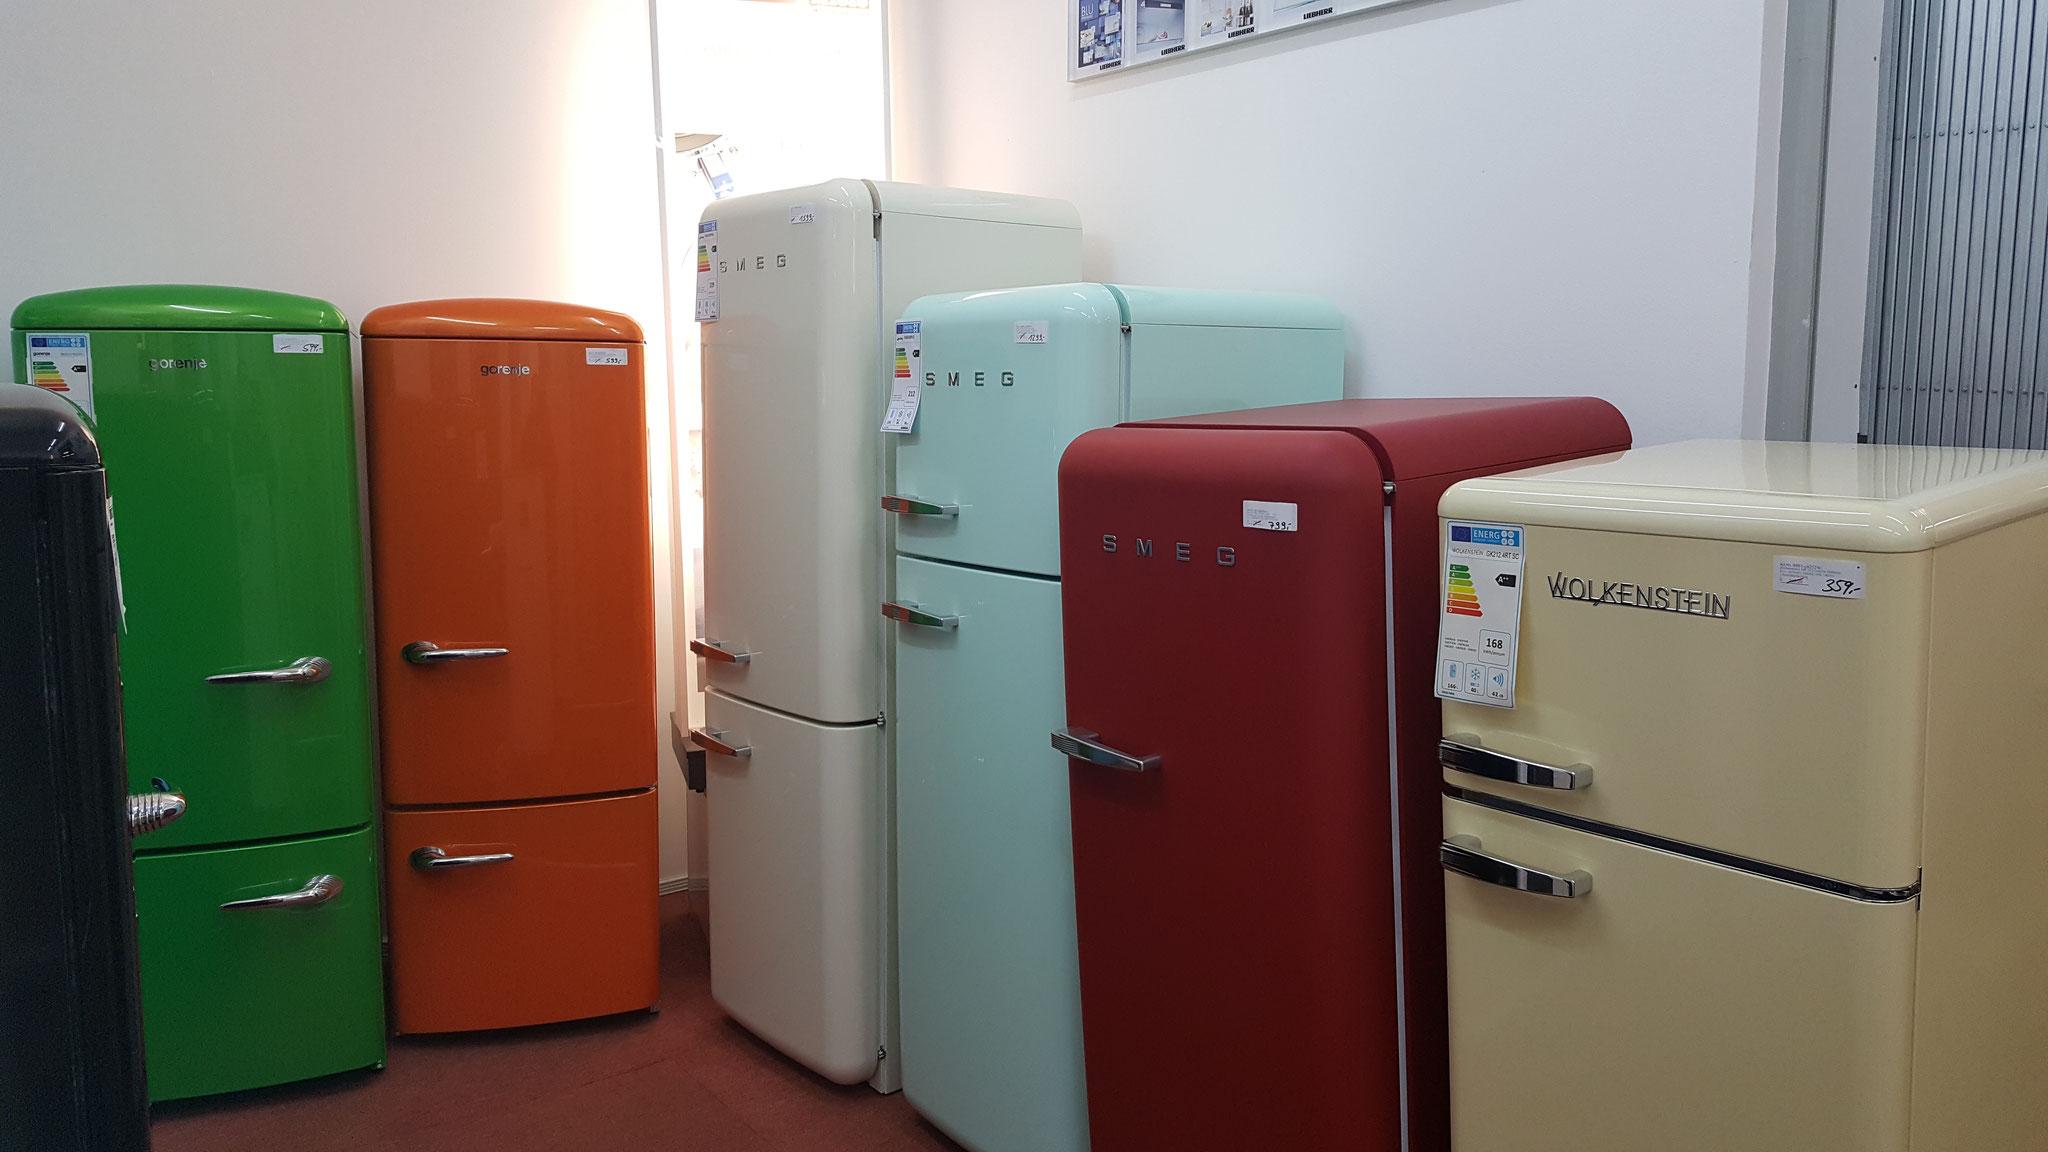 Gorenje Kühlschrank Bulli : Gorenje kühlschrank gefrierkombination kühlschrank